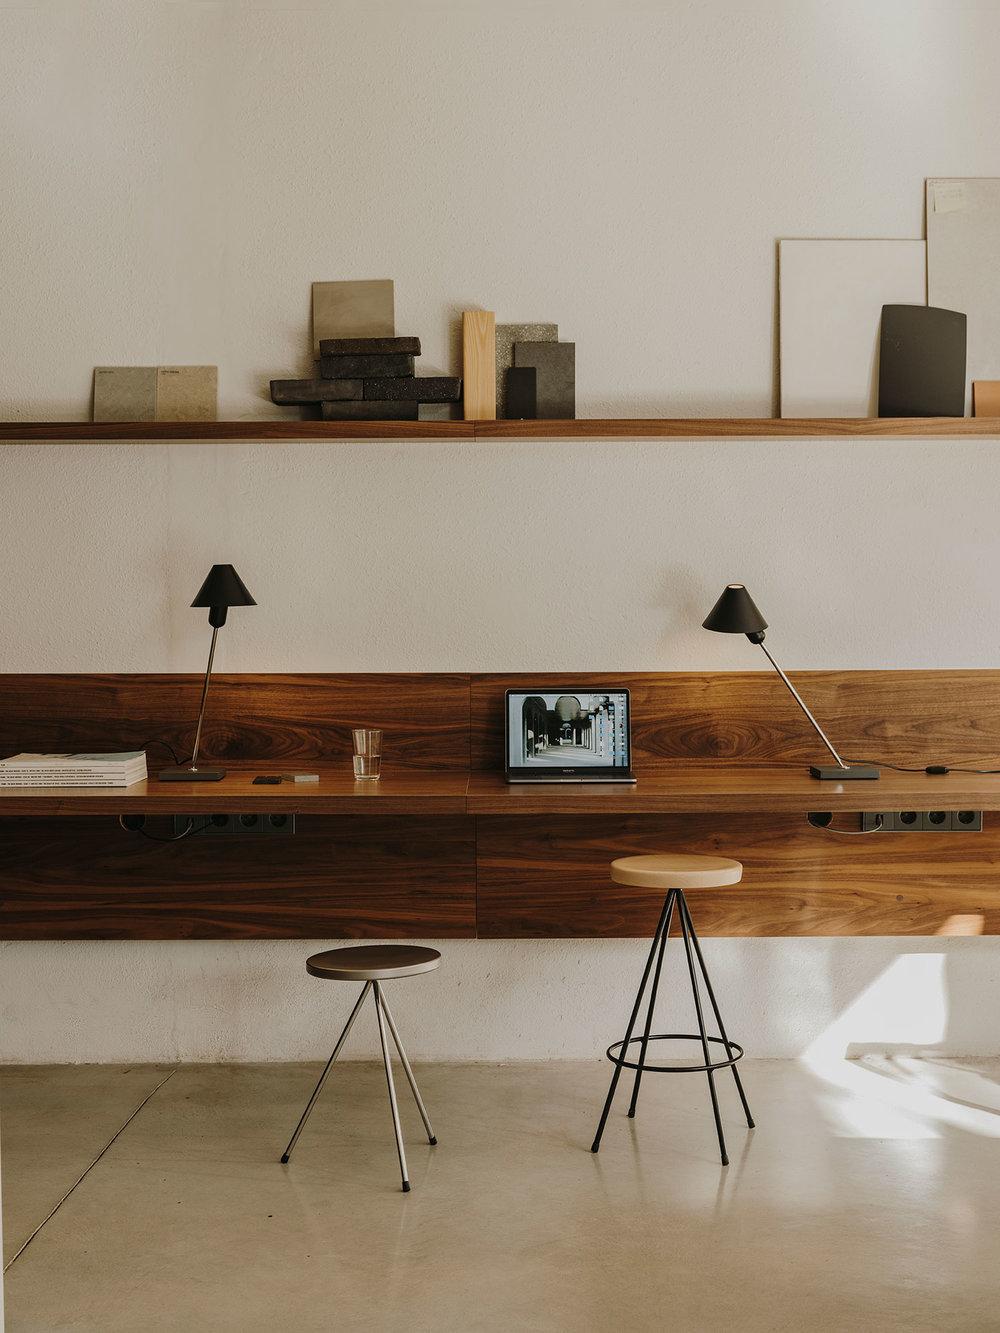 SANTACOLE_TABLE_LAMPS_Gira_Lopez__Salva_6-web.jpg